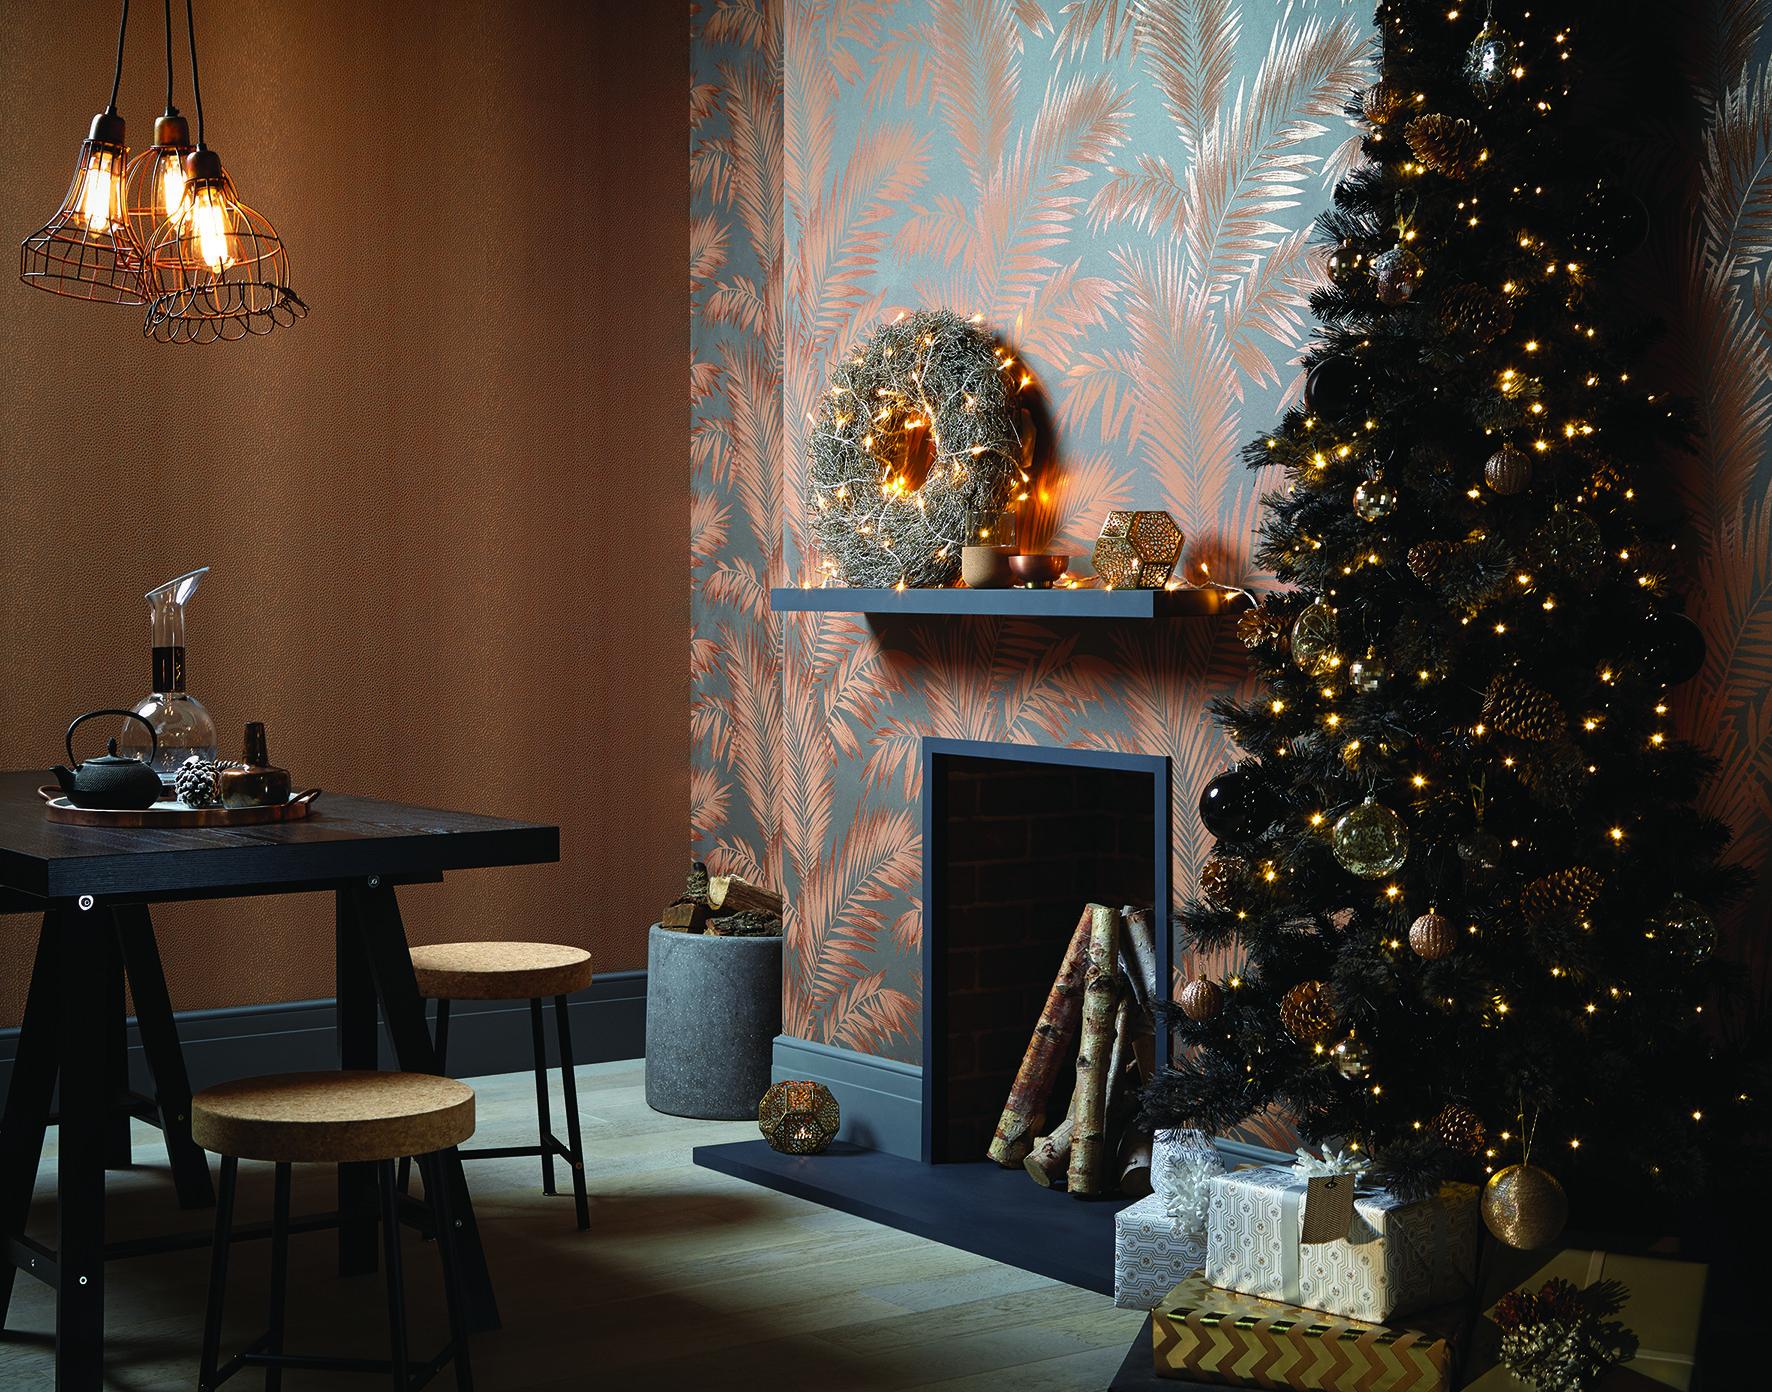 Arthouse Ardita Leaf Pattern Floral Motif Metallic Leaves Wallpaper, £15.99 a roll, I Want Wallpaper